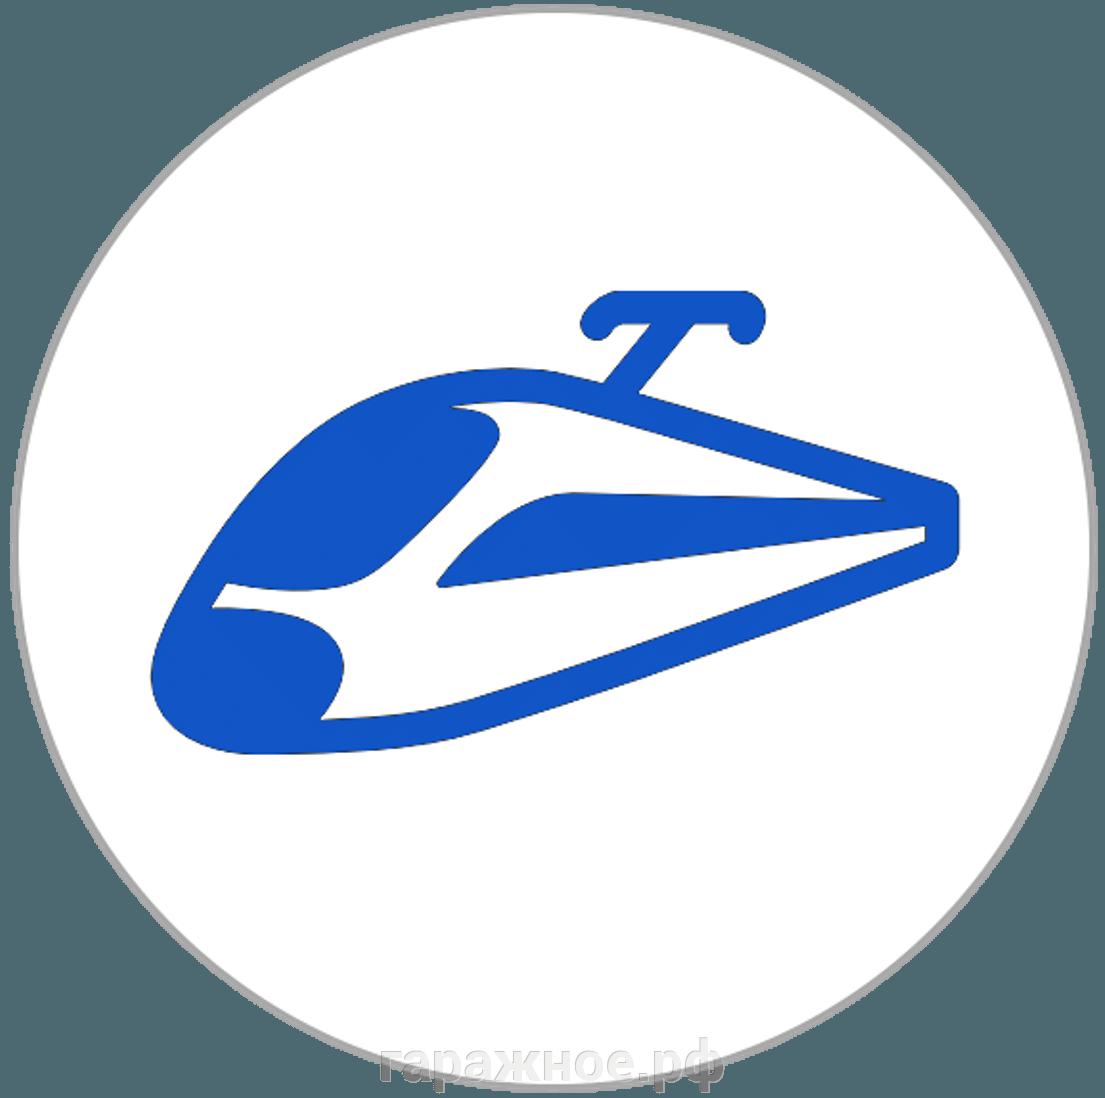 Пуско зарядное устройство железнодорожная техника